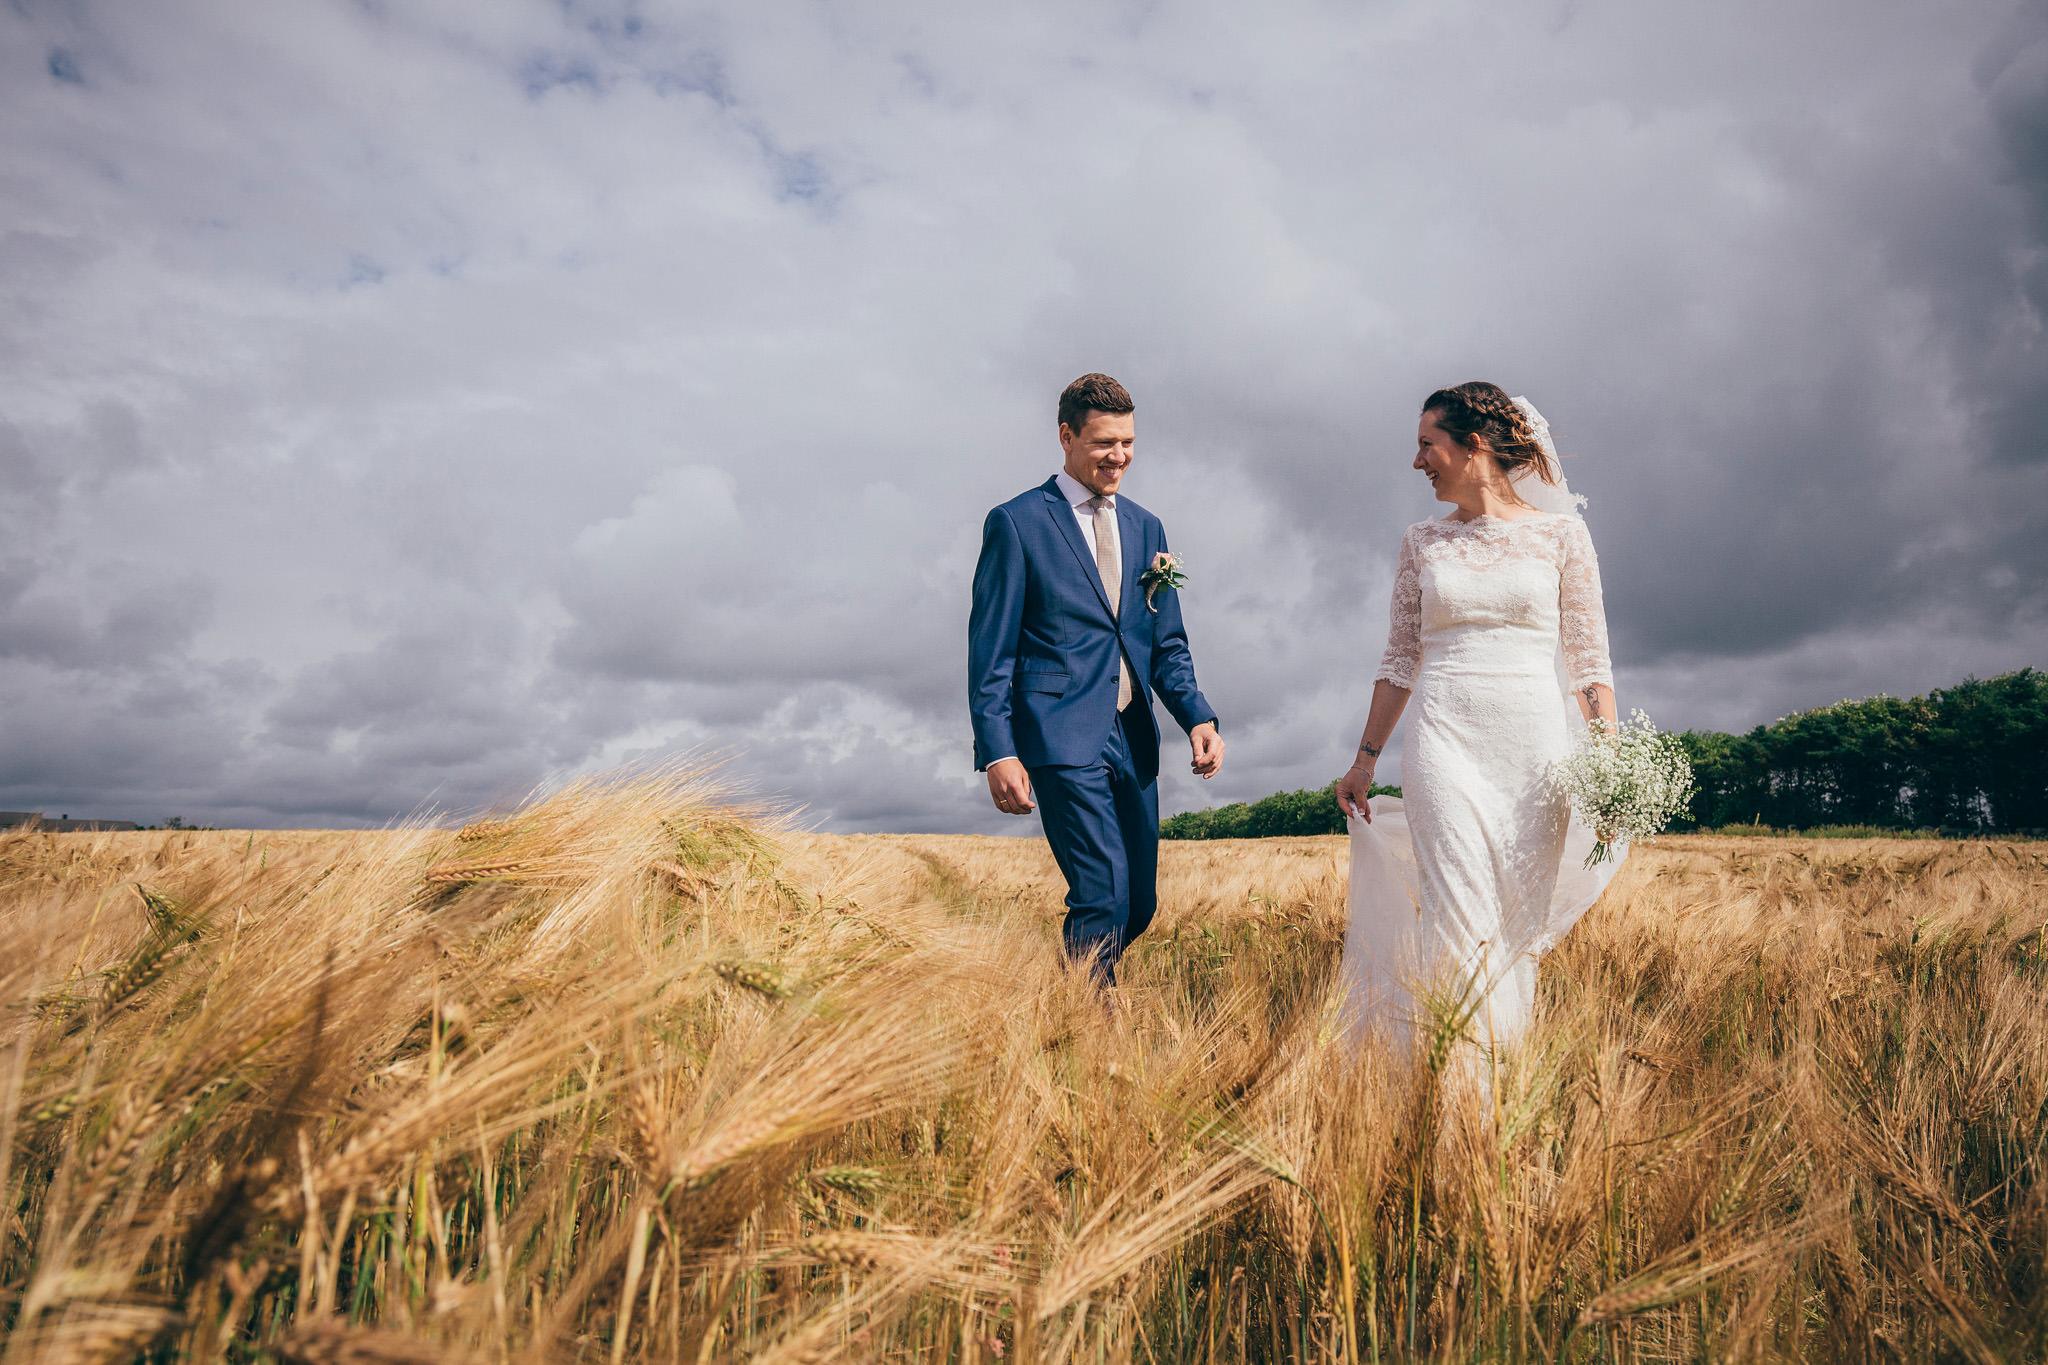 Norway+wedding+photographer+elopement+pre+wedding+Casey+Arneson-82.jpg